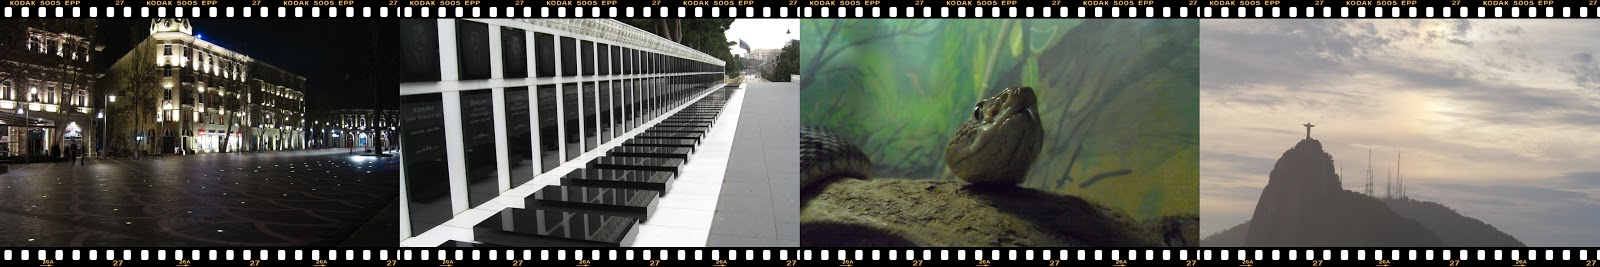 Retrospectiva 2012: Baku, Azerbaijan; Sao Paulo si Rio de Janeiro, Brazilia